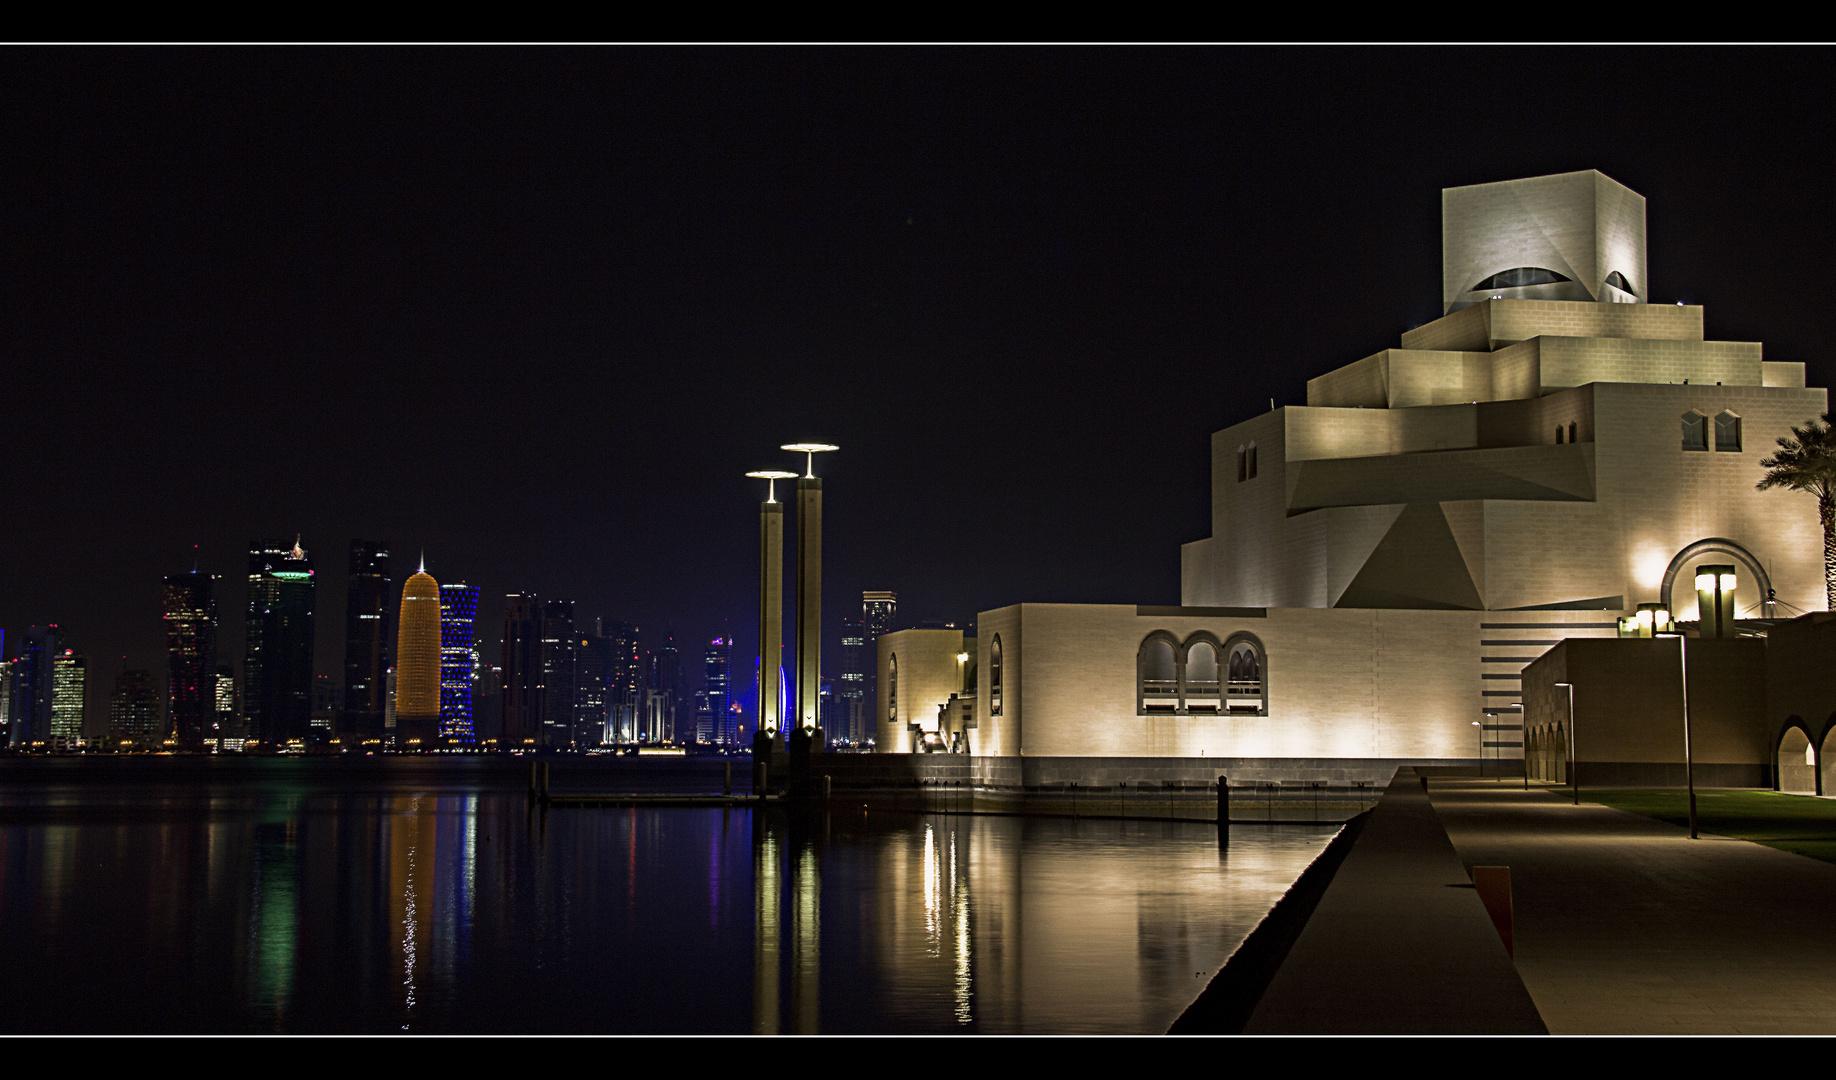 Museum für Islamische Kunst (Doha)